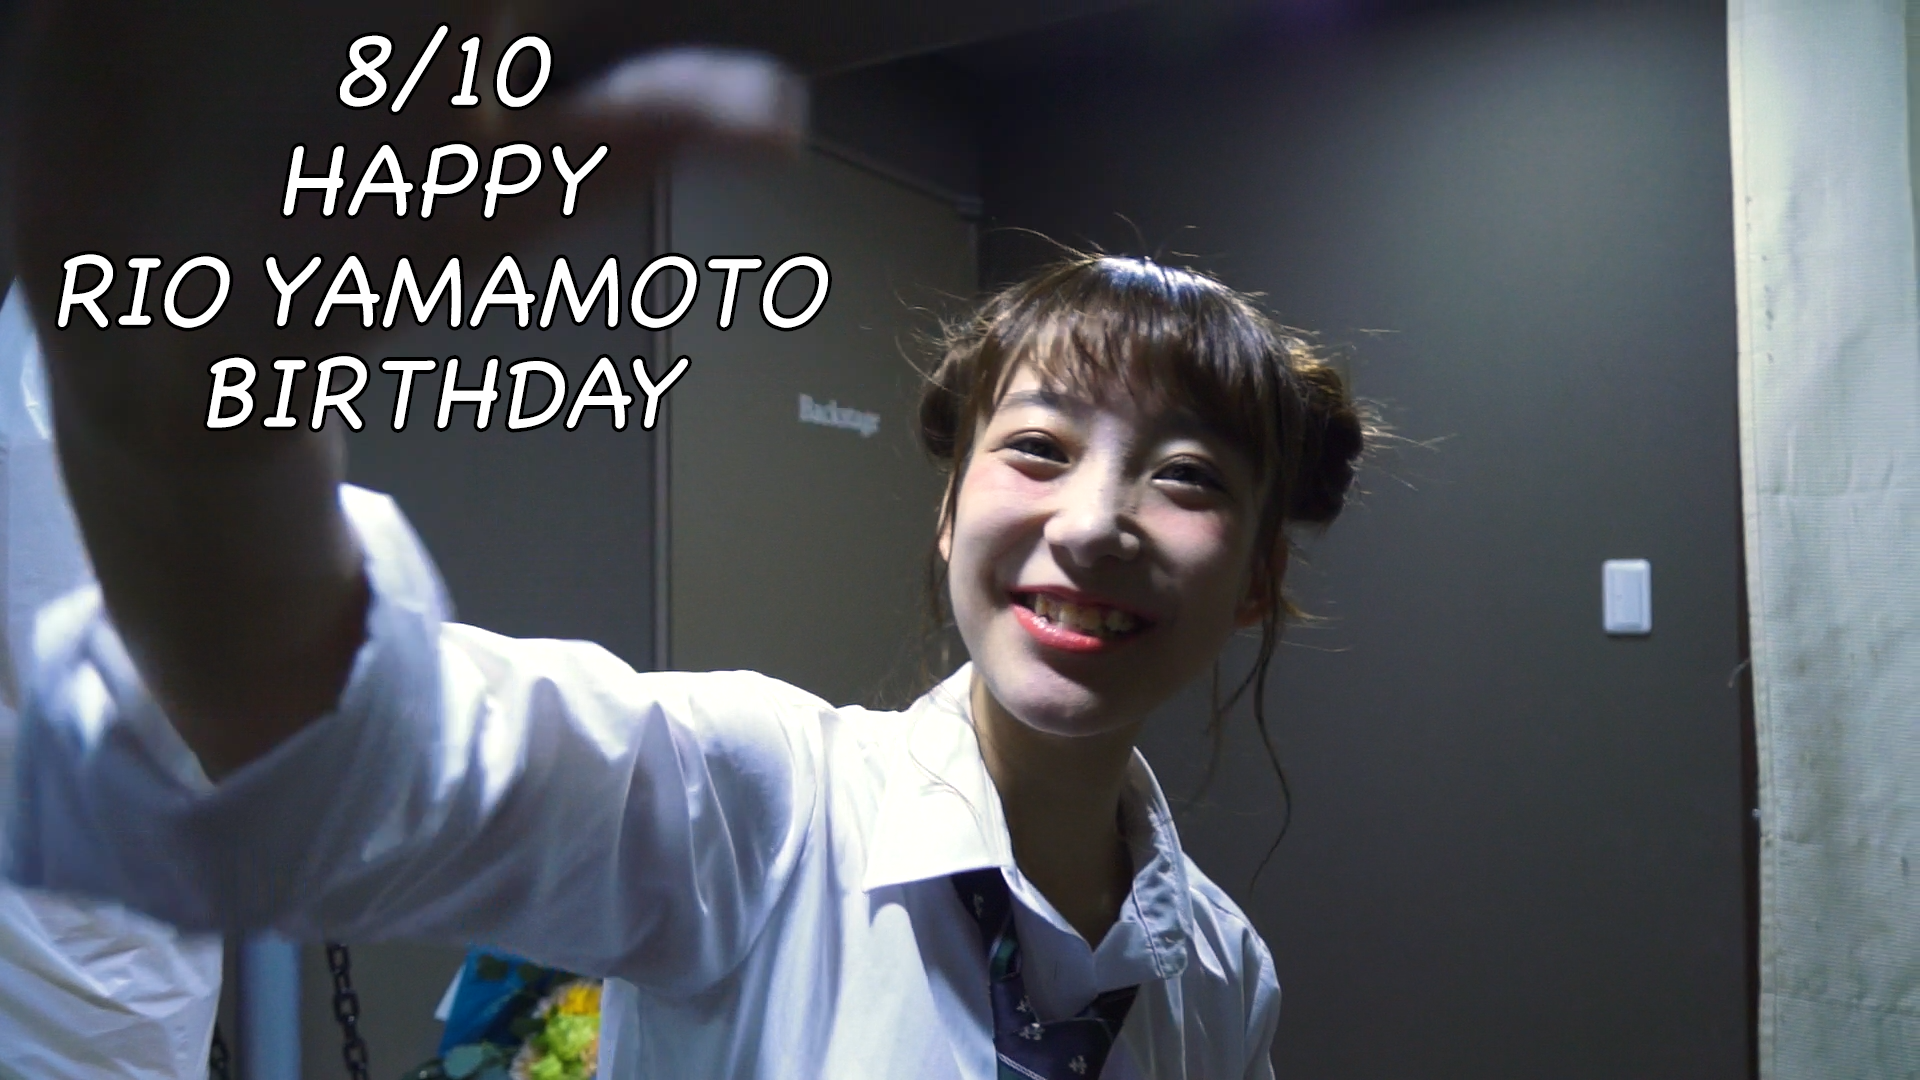 8/10 HAPPY RIO YAMAMOTO BIRTHDAY